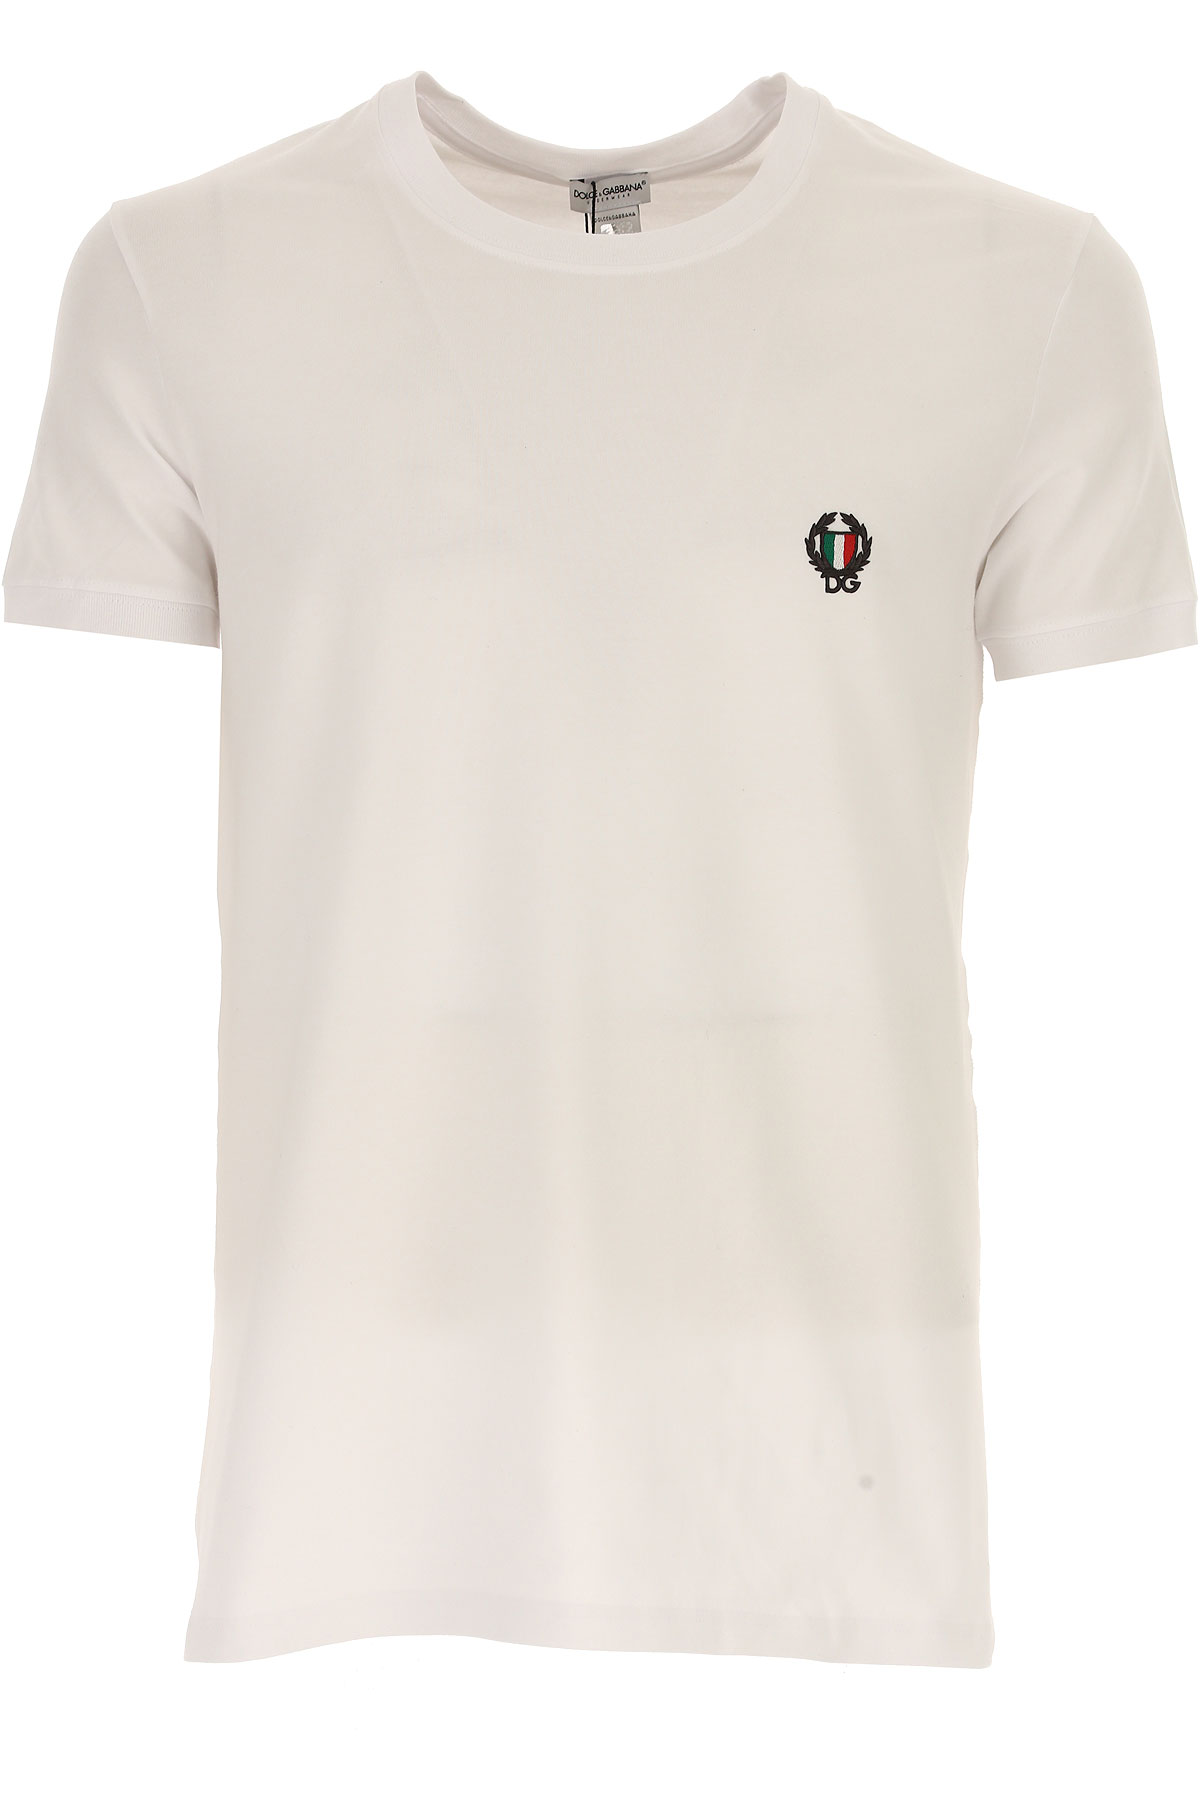 Image of Dolce & Gabbana T-Shirt for Men, White, Cotton, 2017, S (EU 3) M (EU 4) L (EU 5) XL (EU 6) XXL (EU 7)